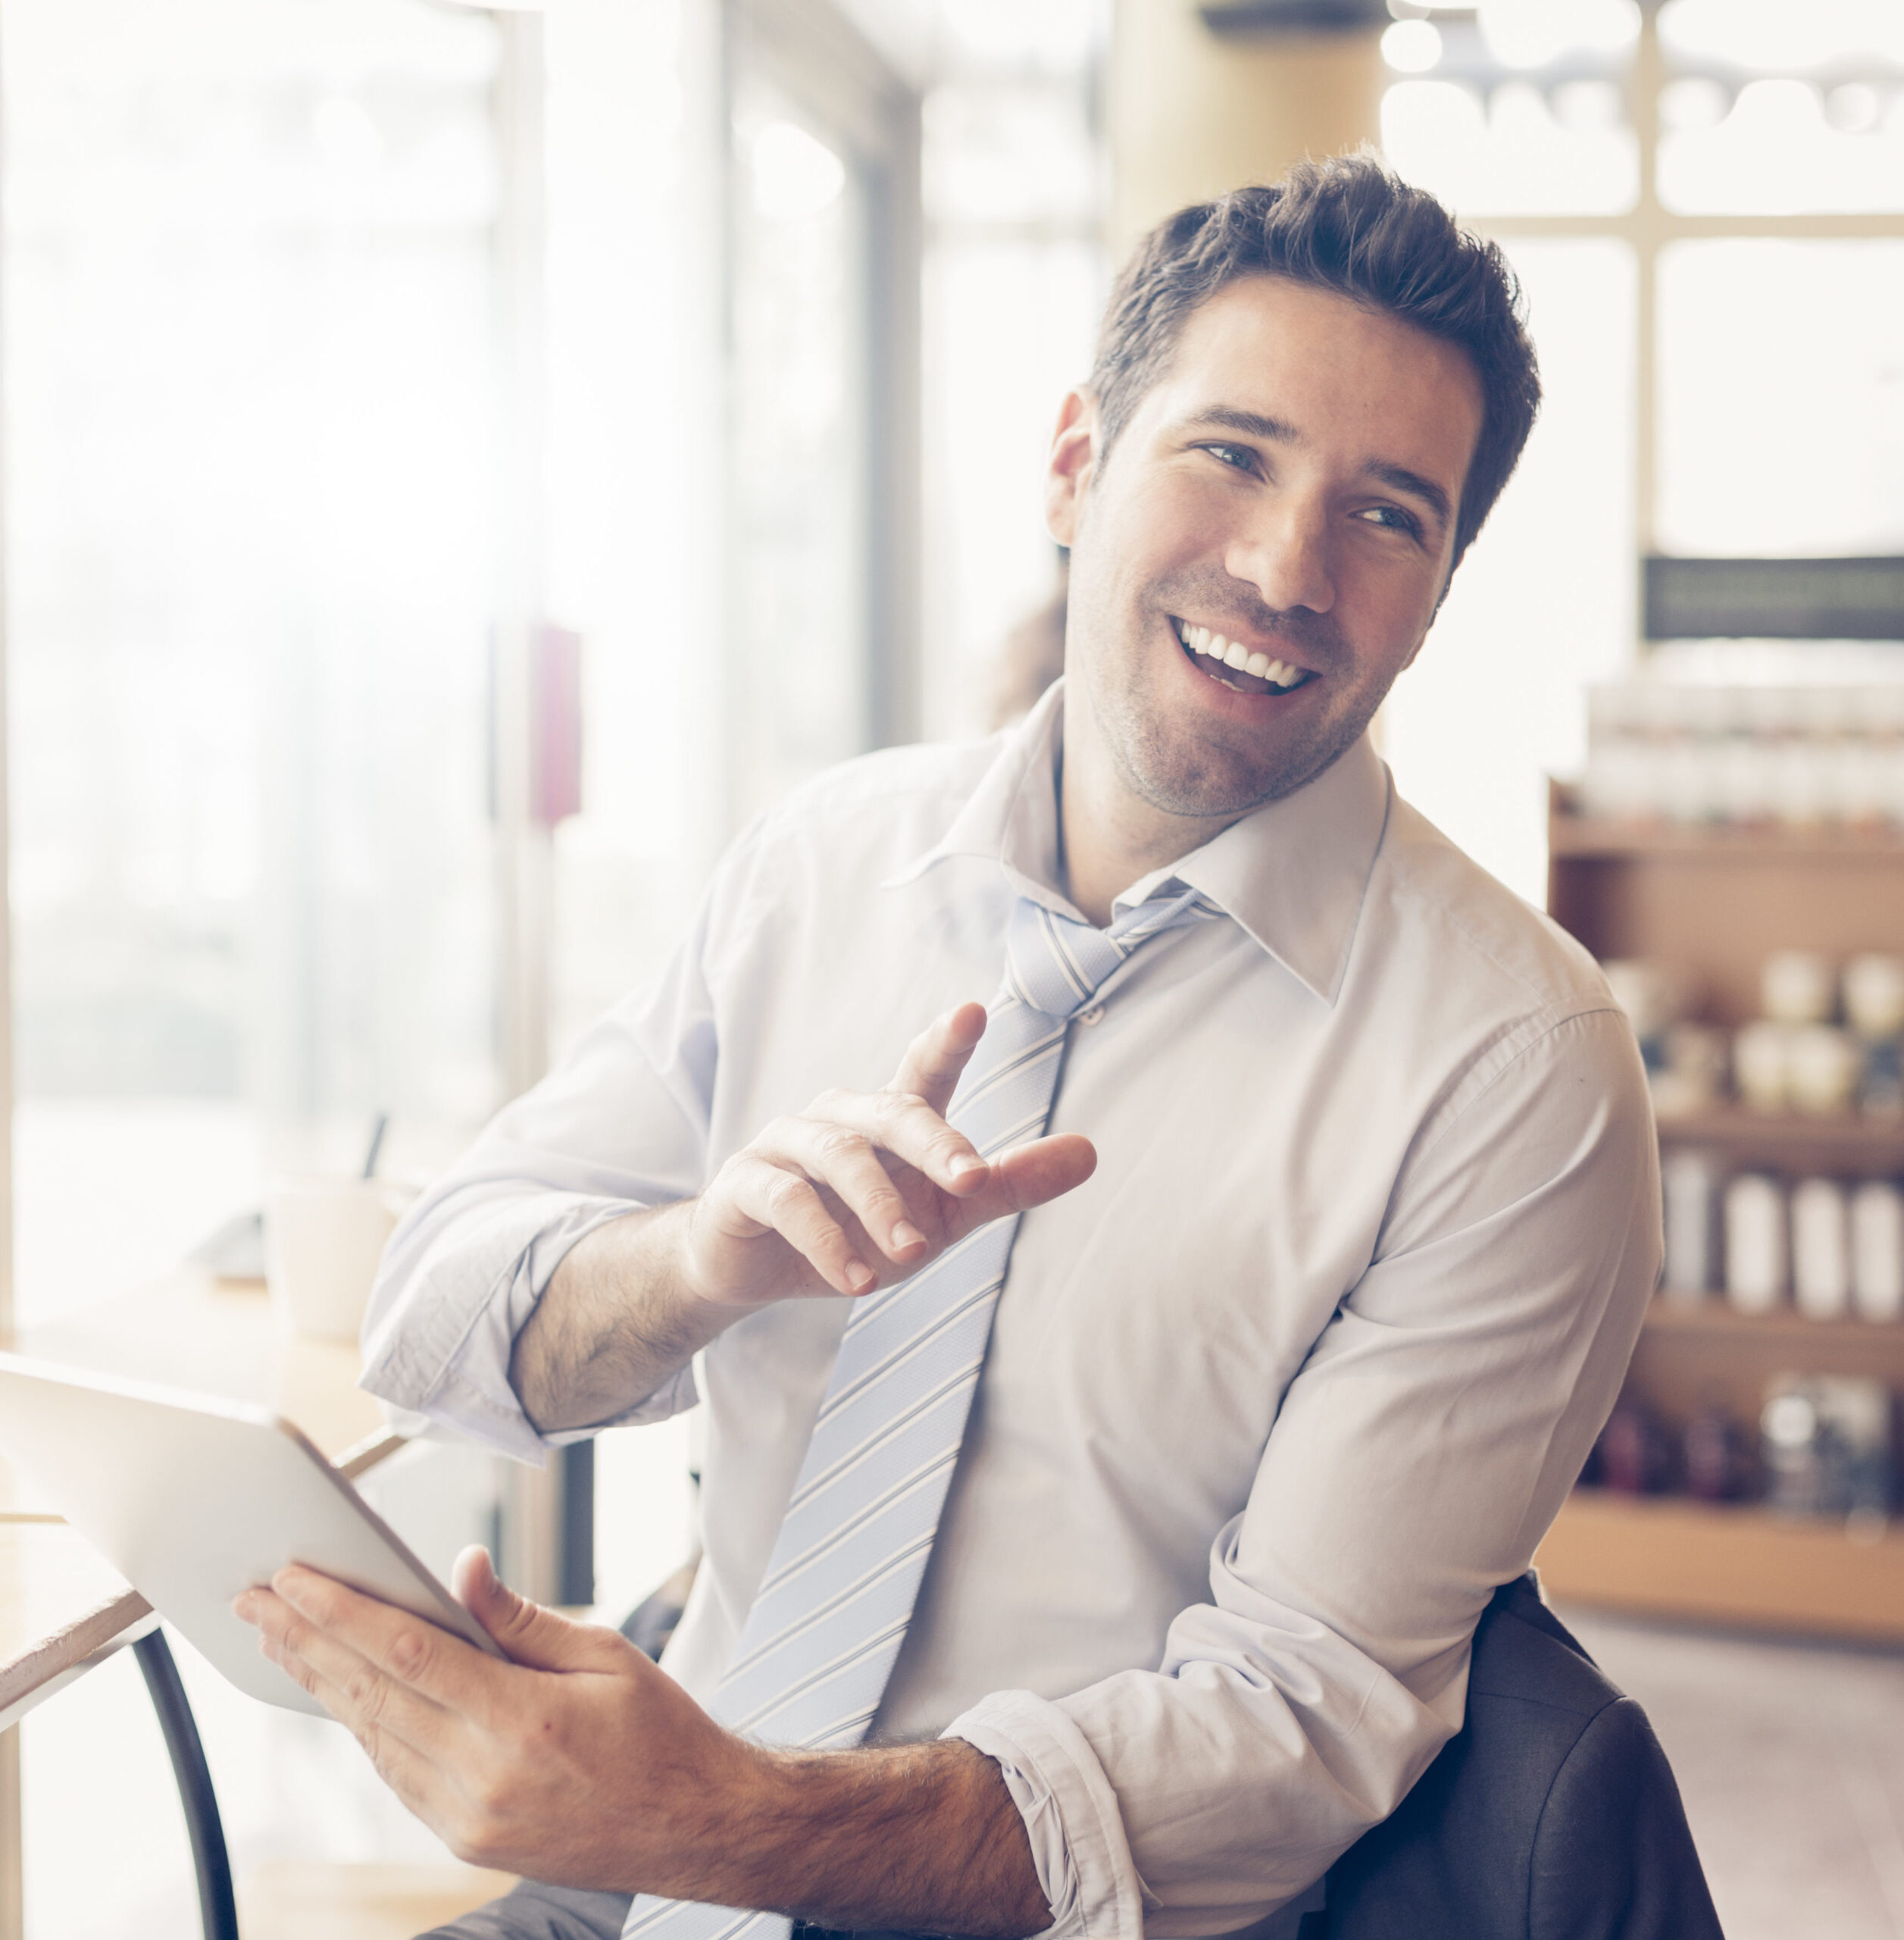 Insight24 goed in oplossingen, kennis van business en technologie